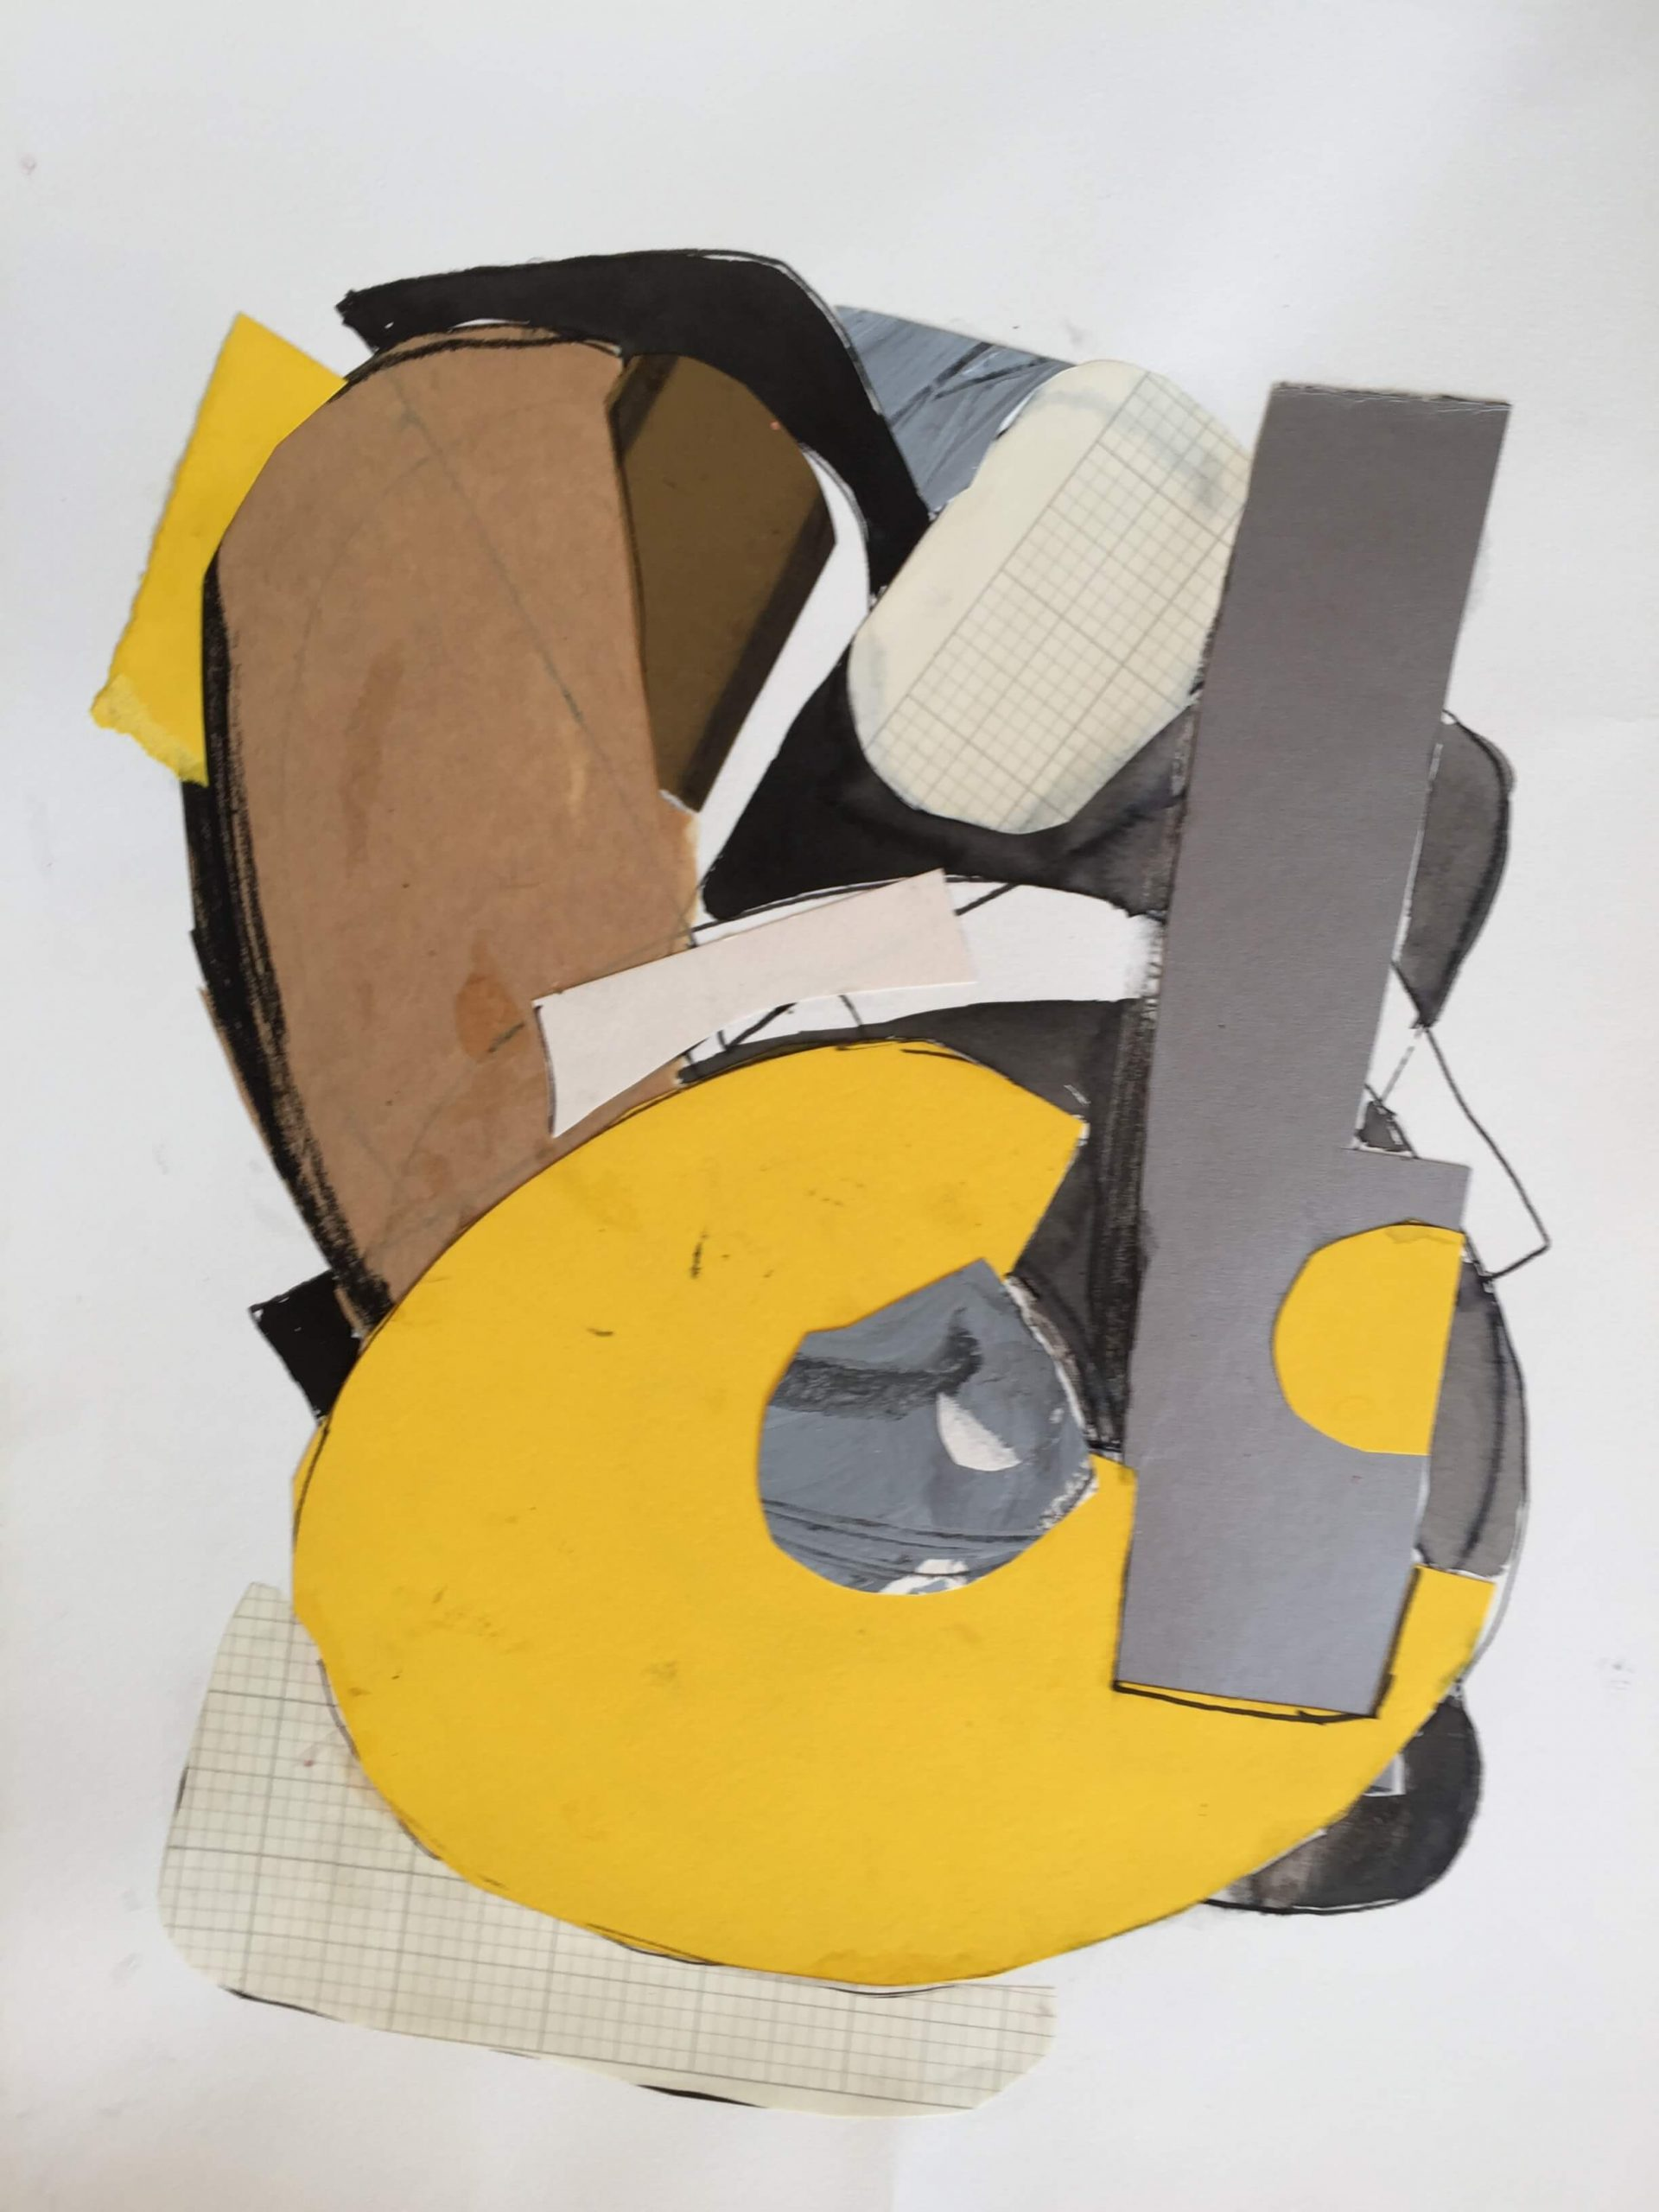 Lucinda McDonald: Collage with Yellow